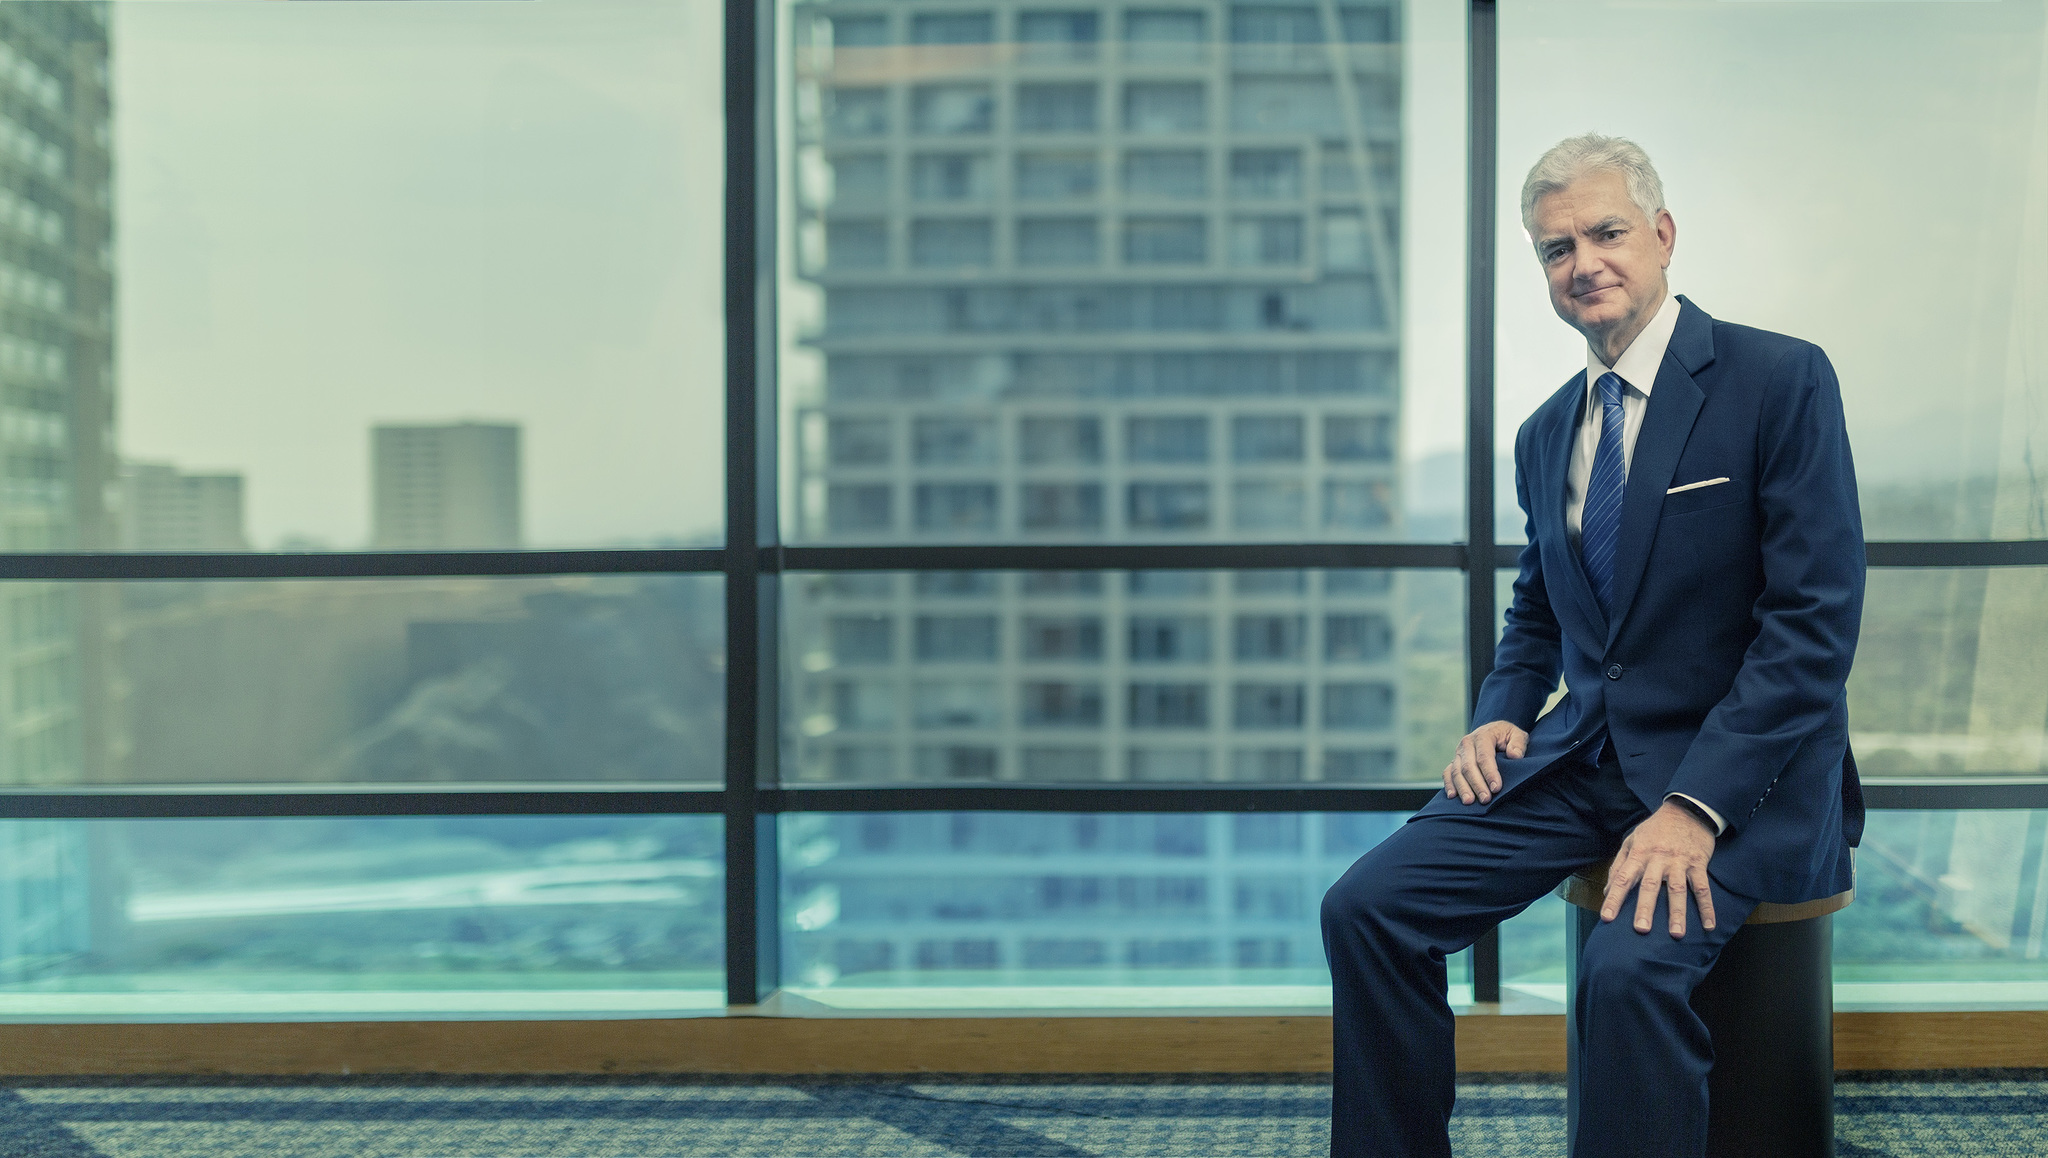 Fibra Prologis invests US$5 million in Mexico City